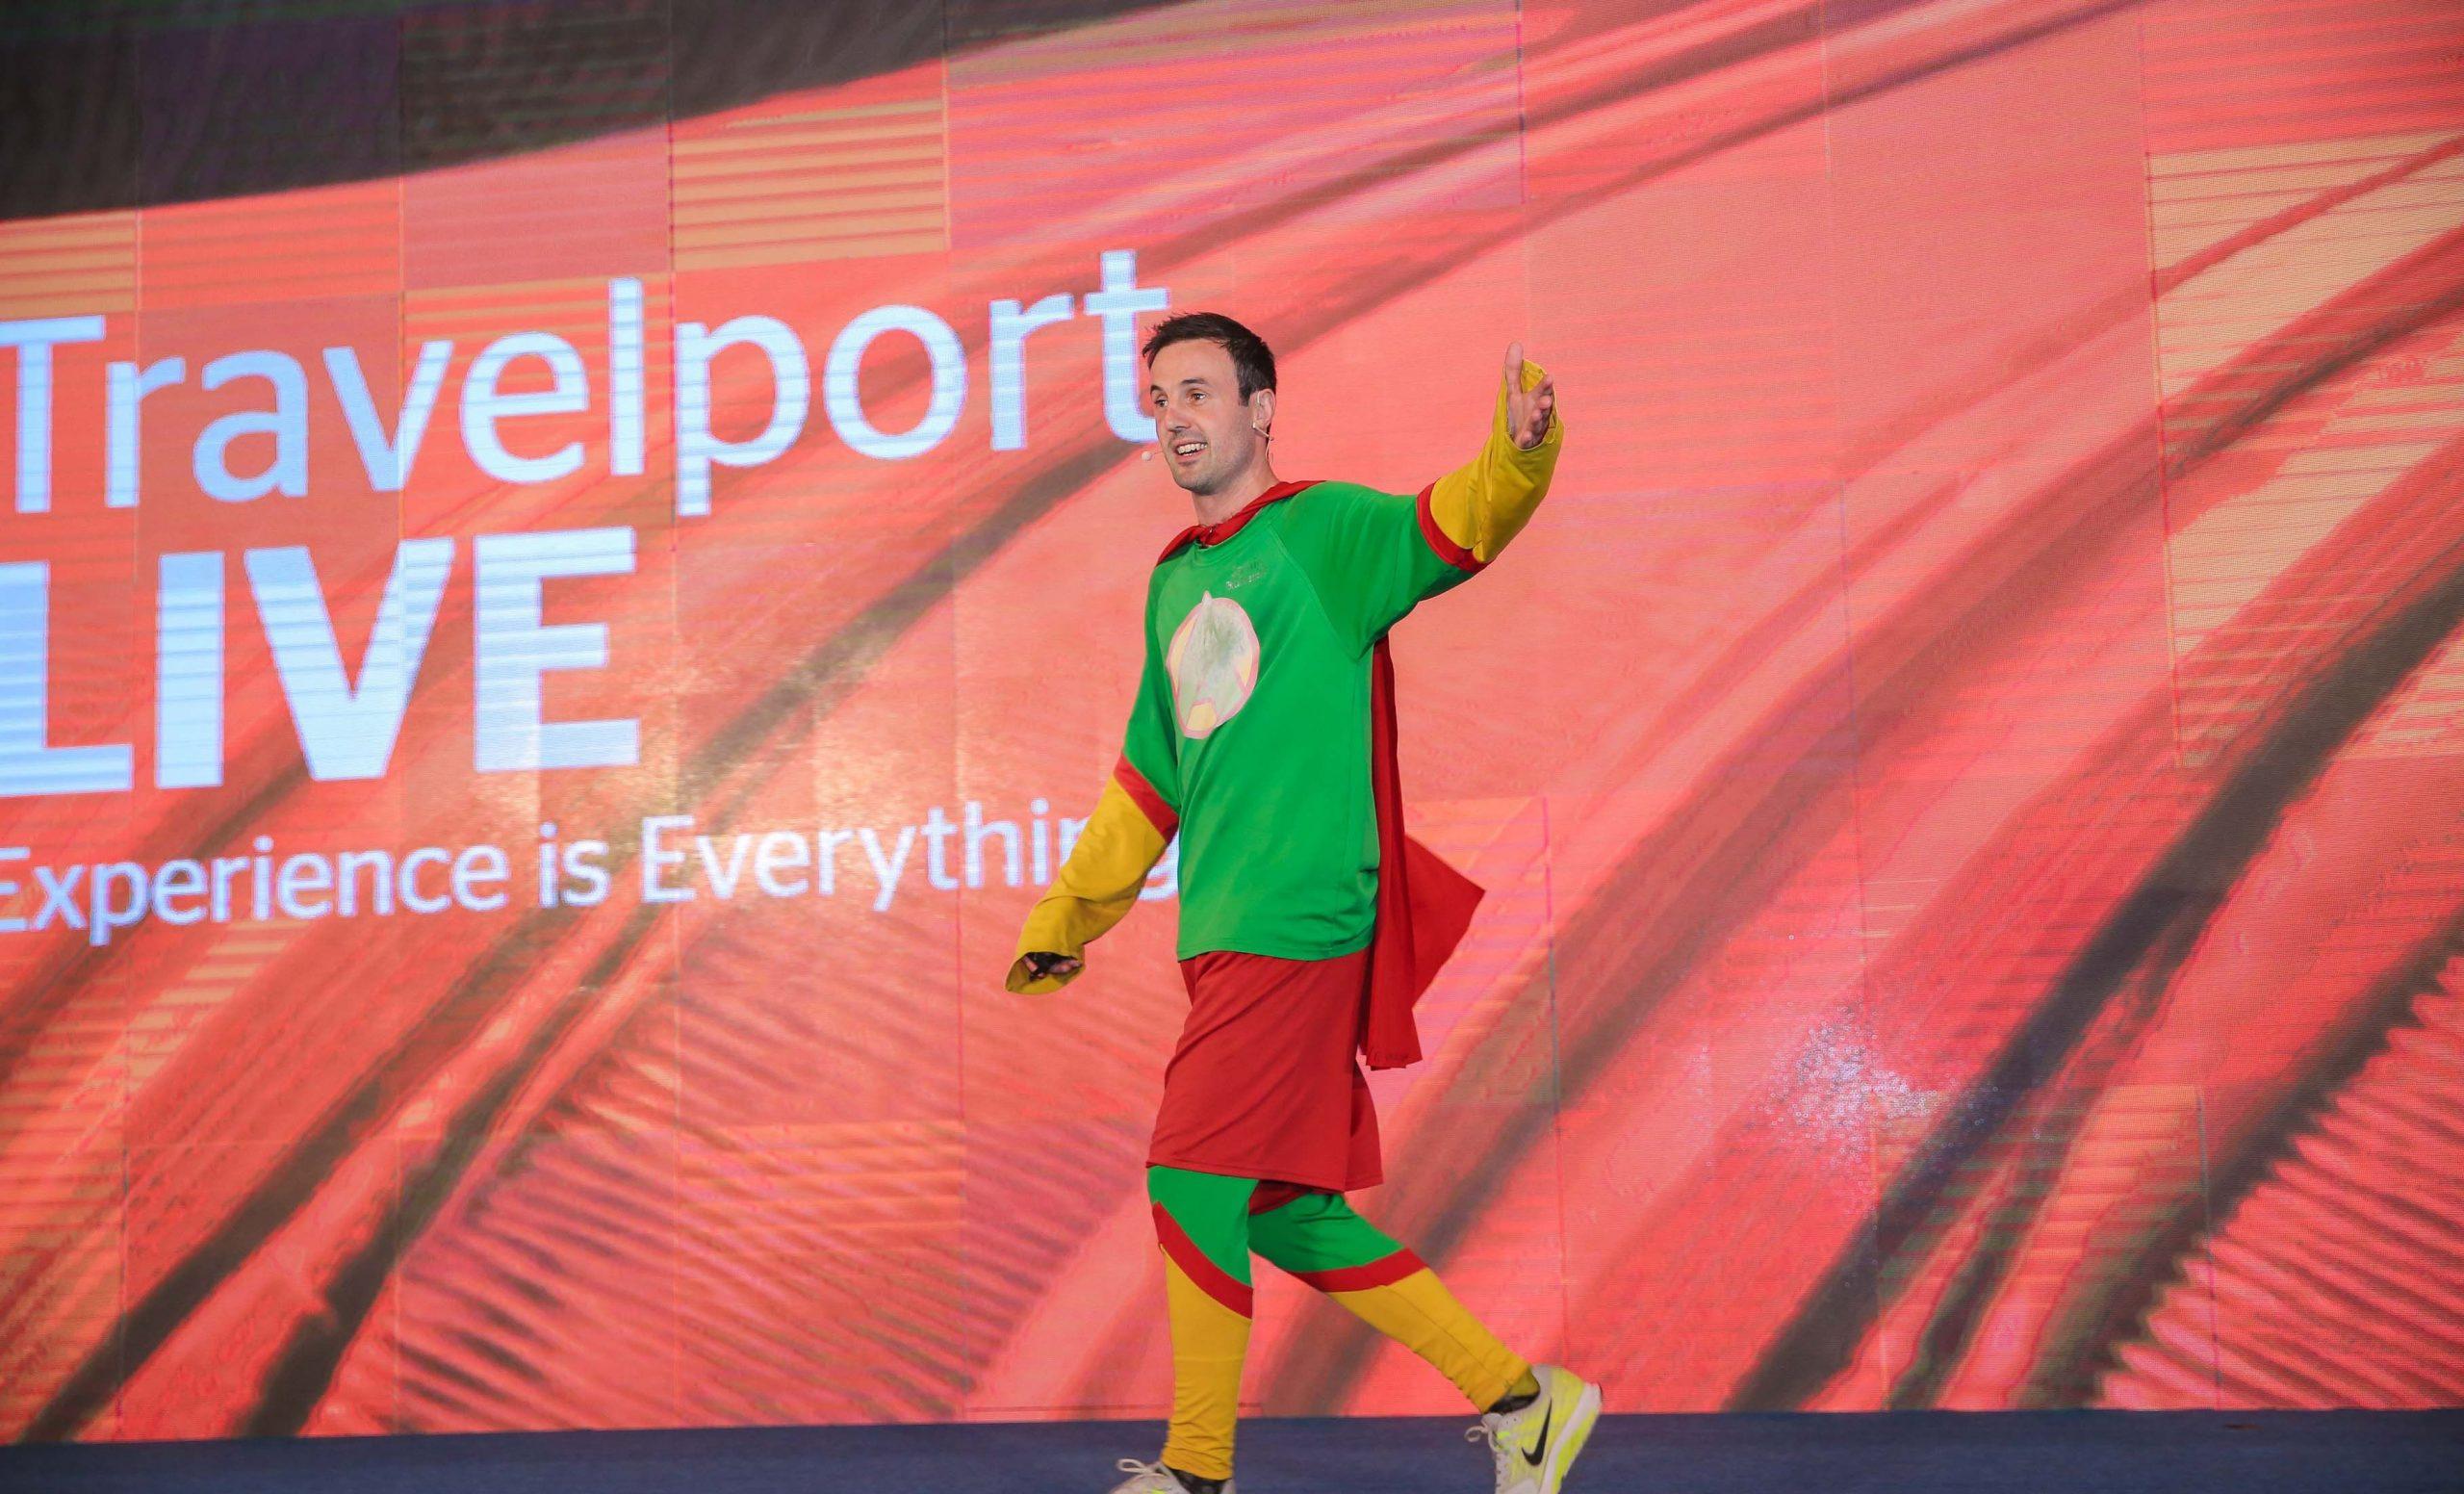 Motivational Speaker, Jamie MacDonald, known as Adventureman on stage